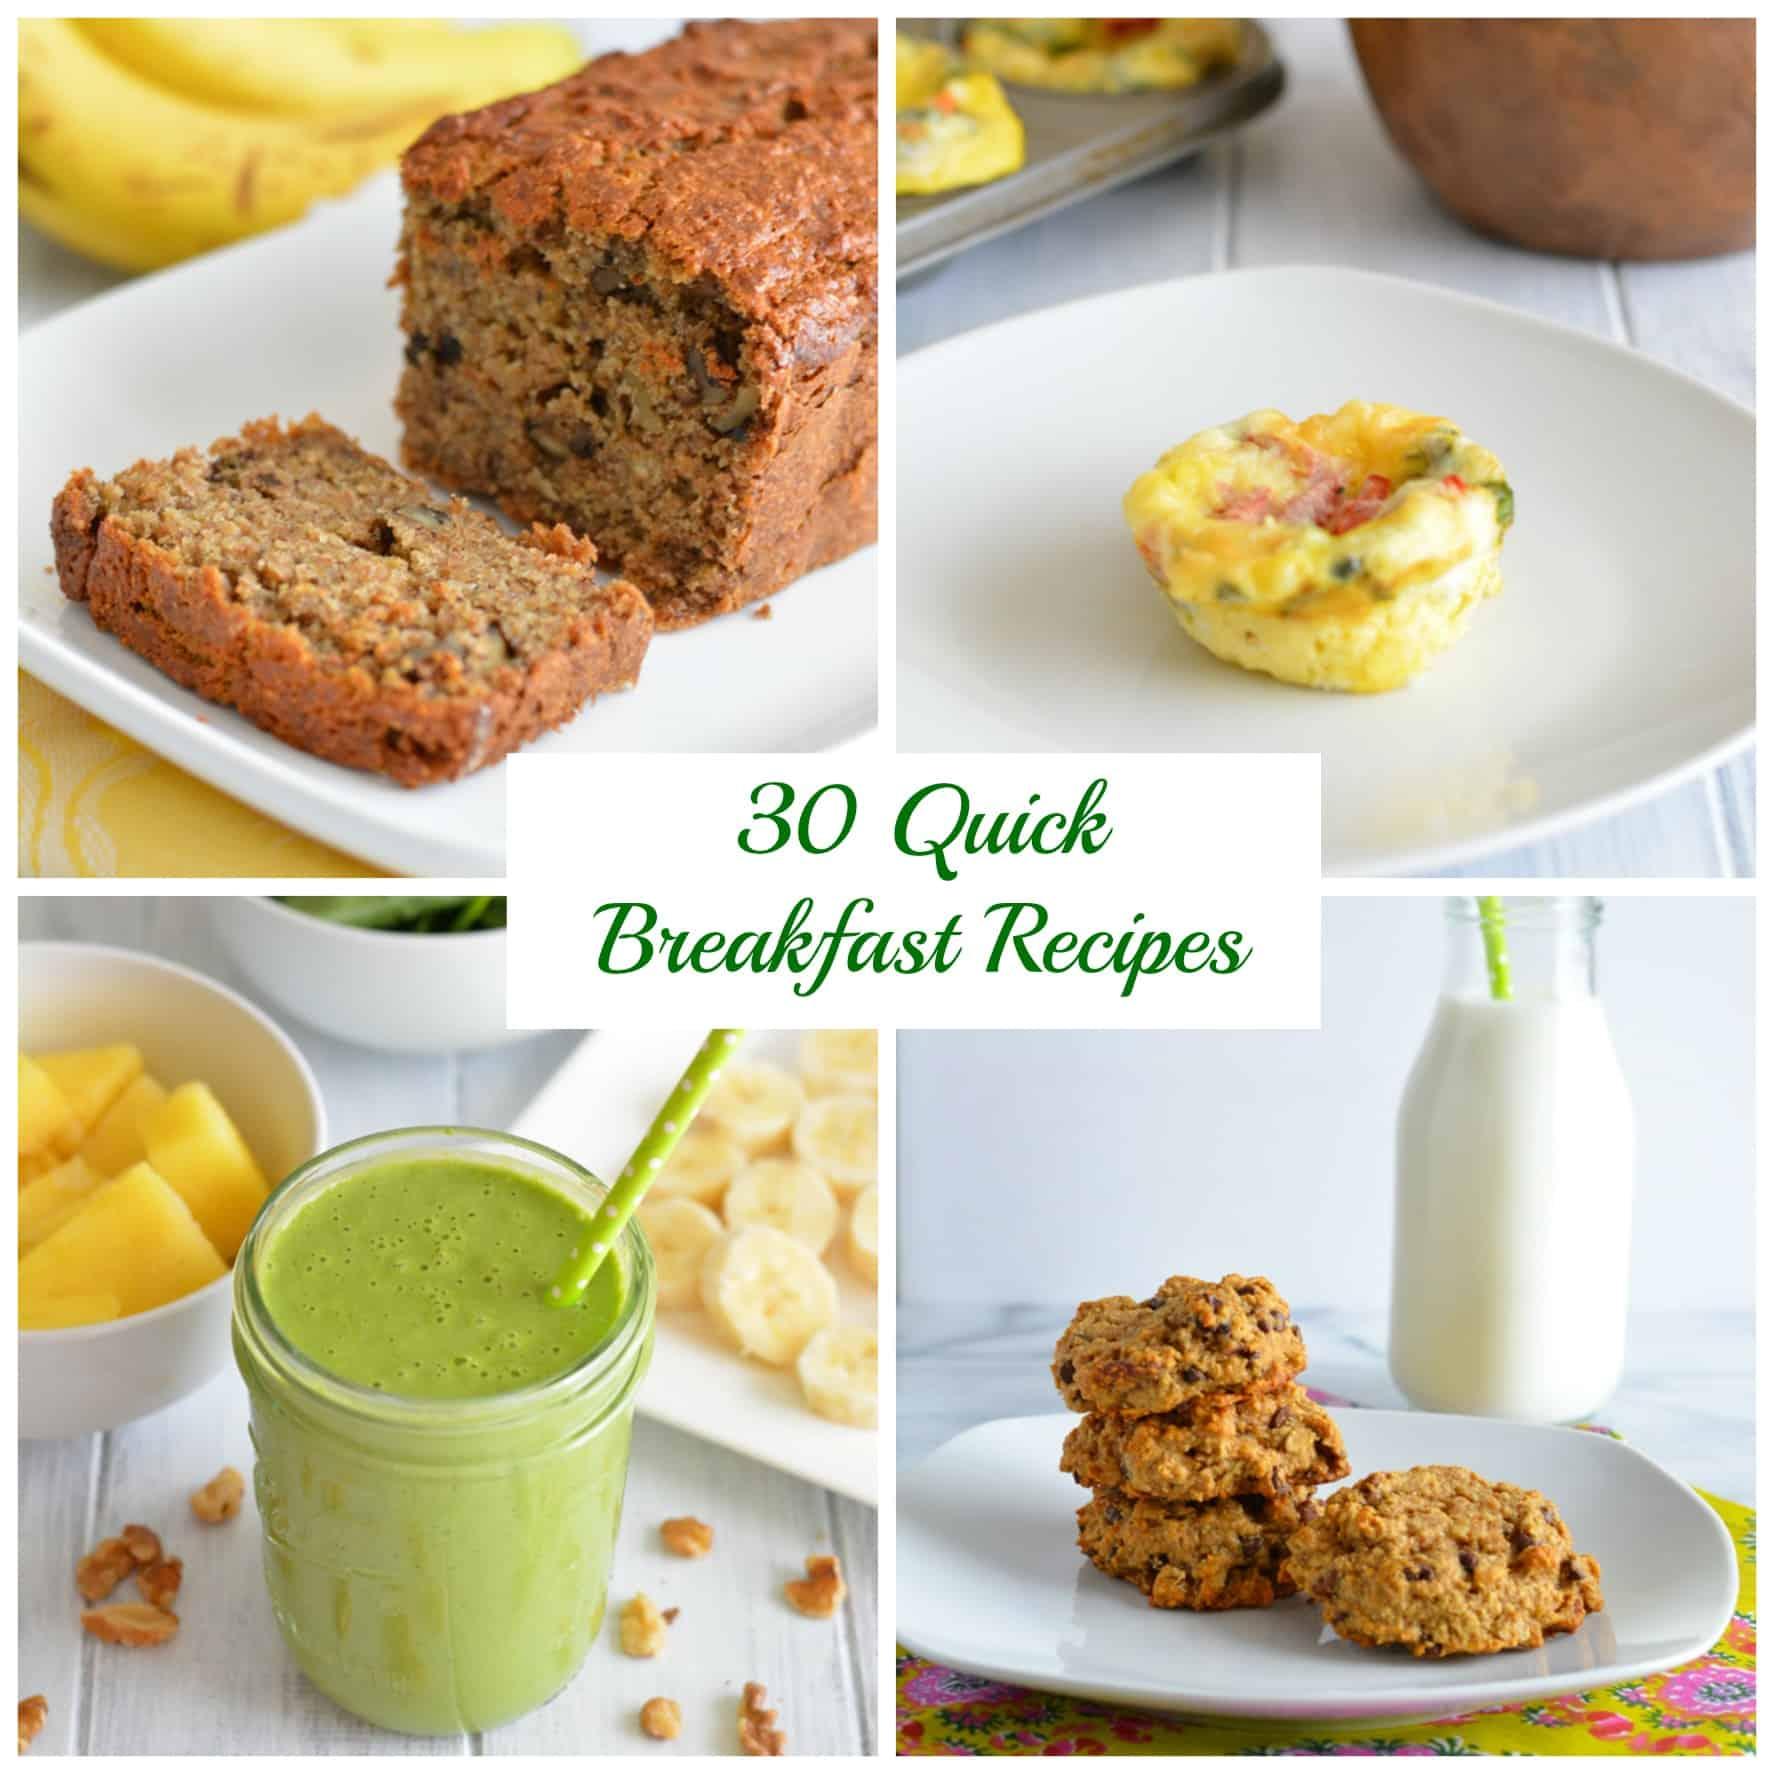 30 Quick Breakfast Recipes